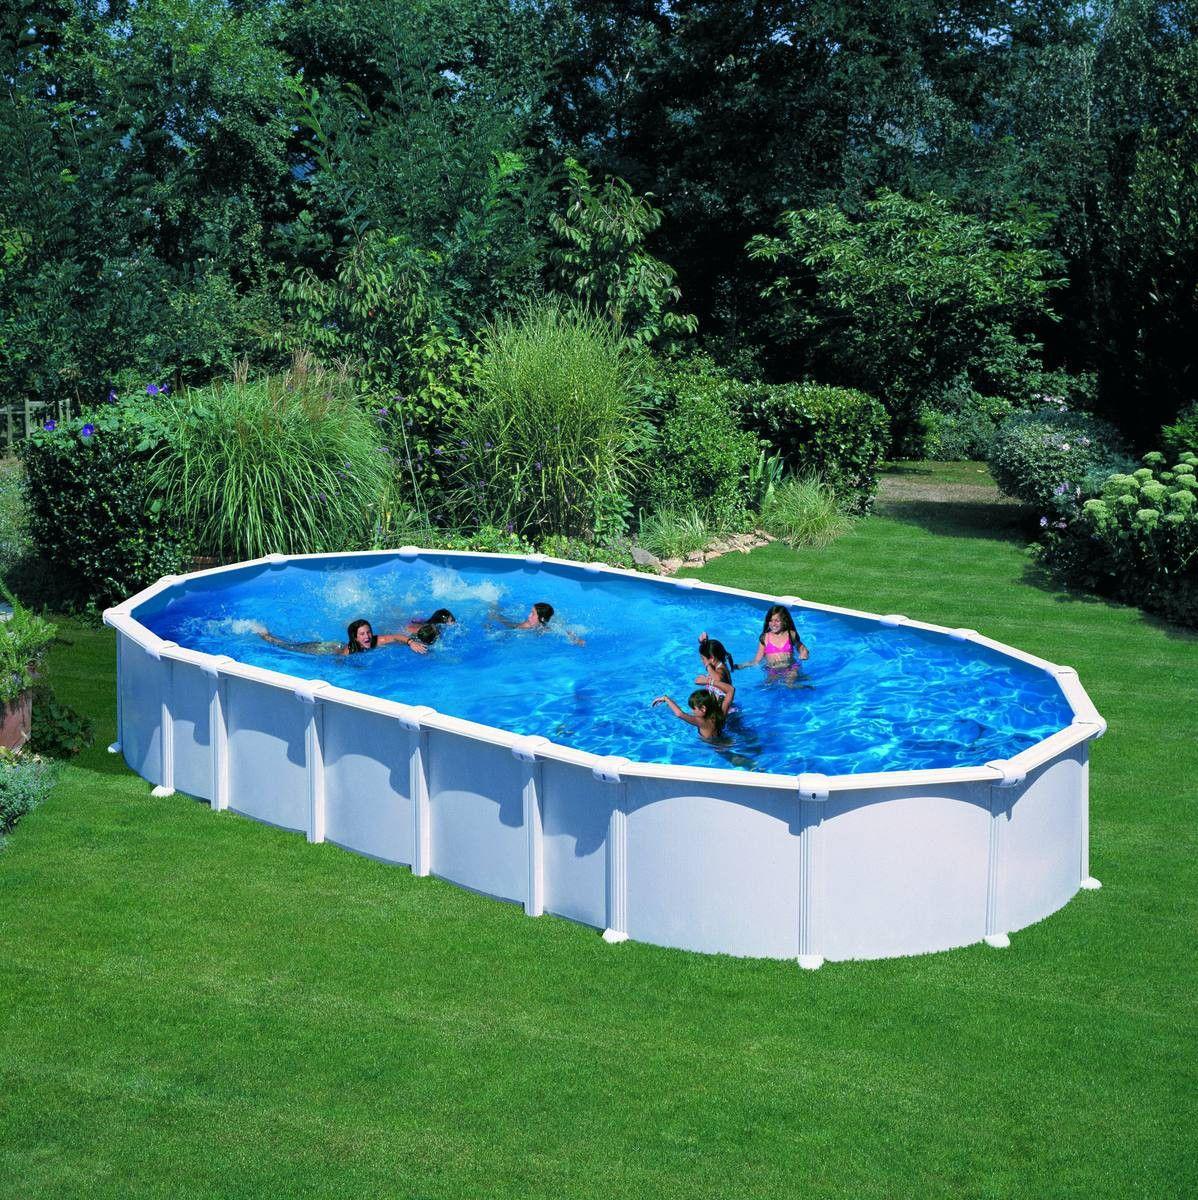 Piscine Gre D1000X550 H132 Hors Sol Acier Dream Pool Ovale ... tout Piscine Hors Sol Acier Ovale